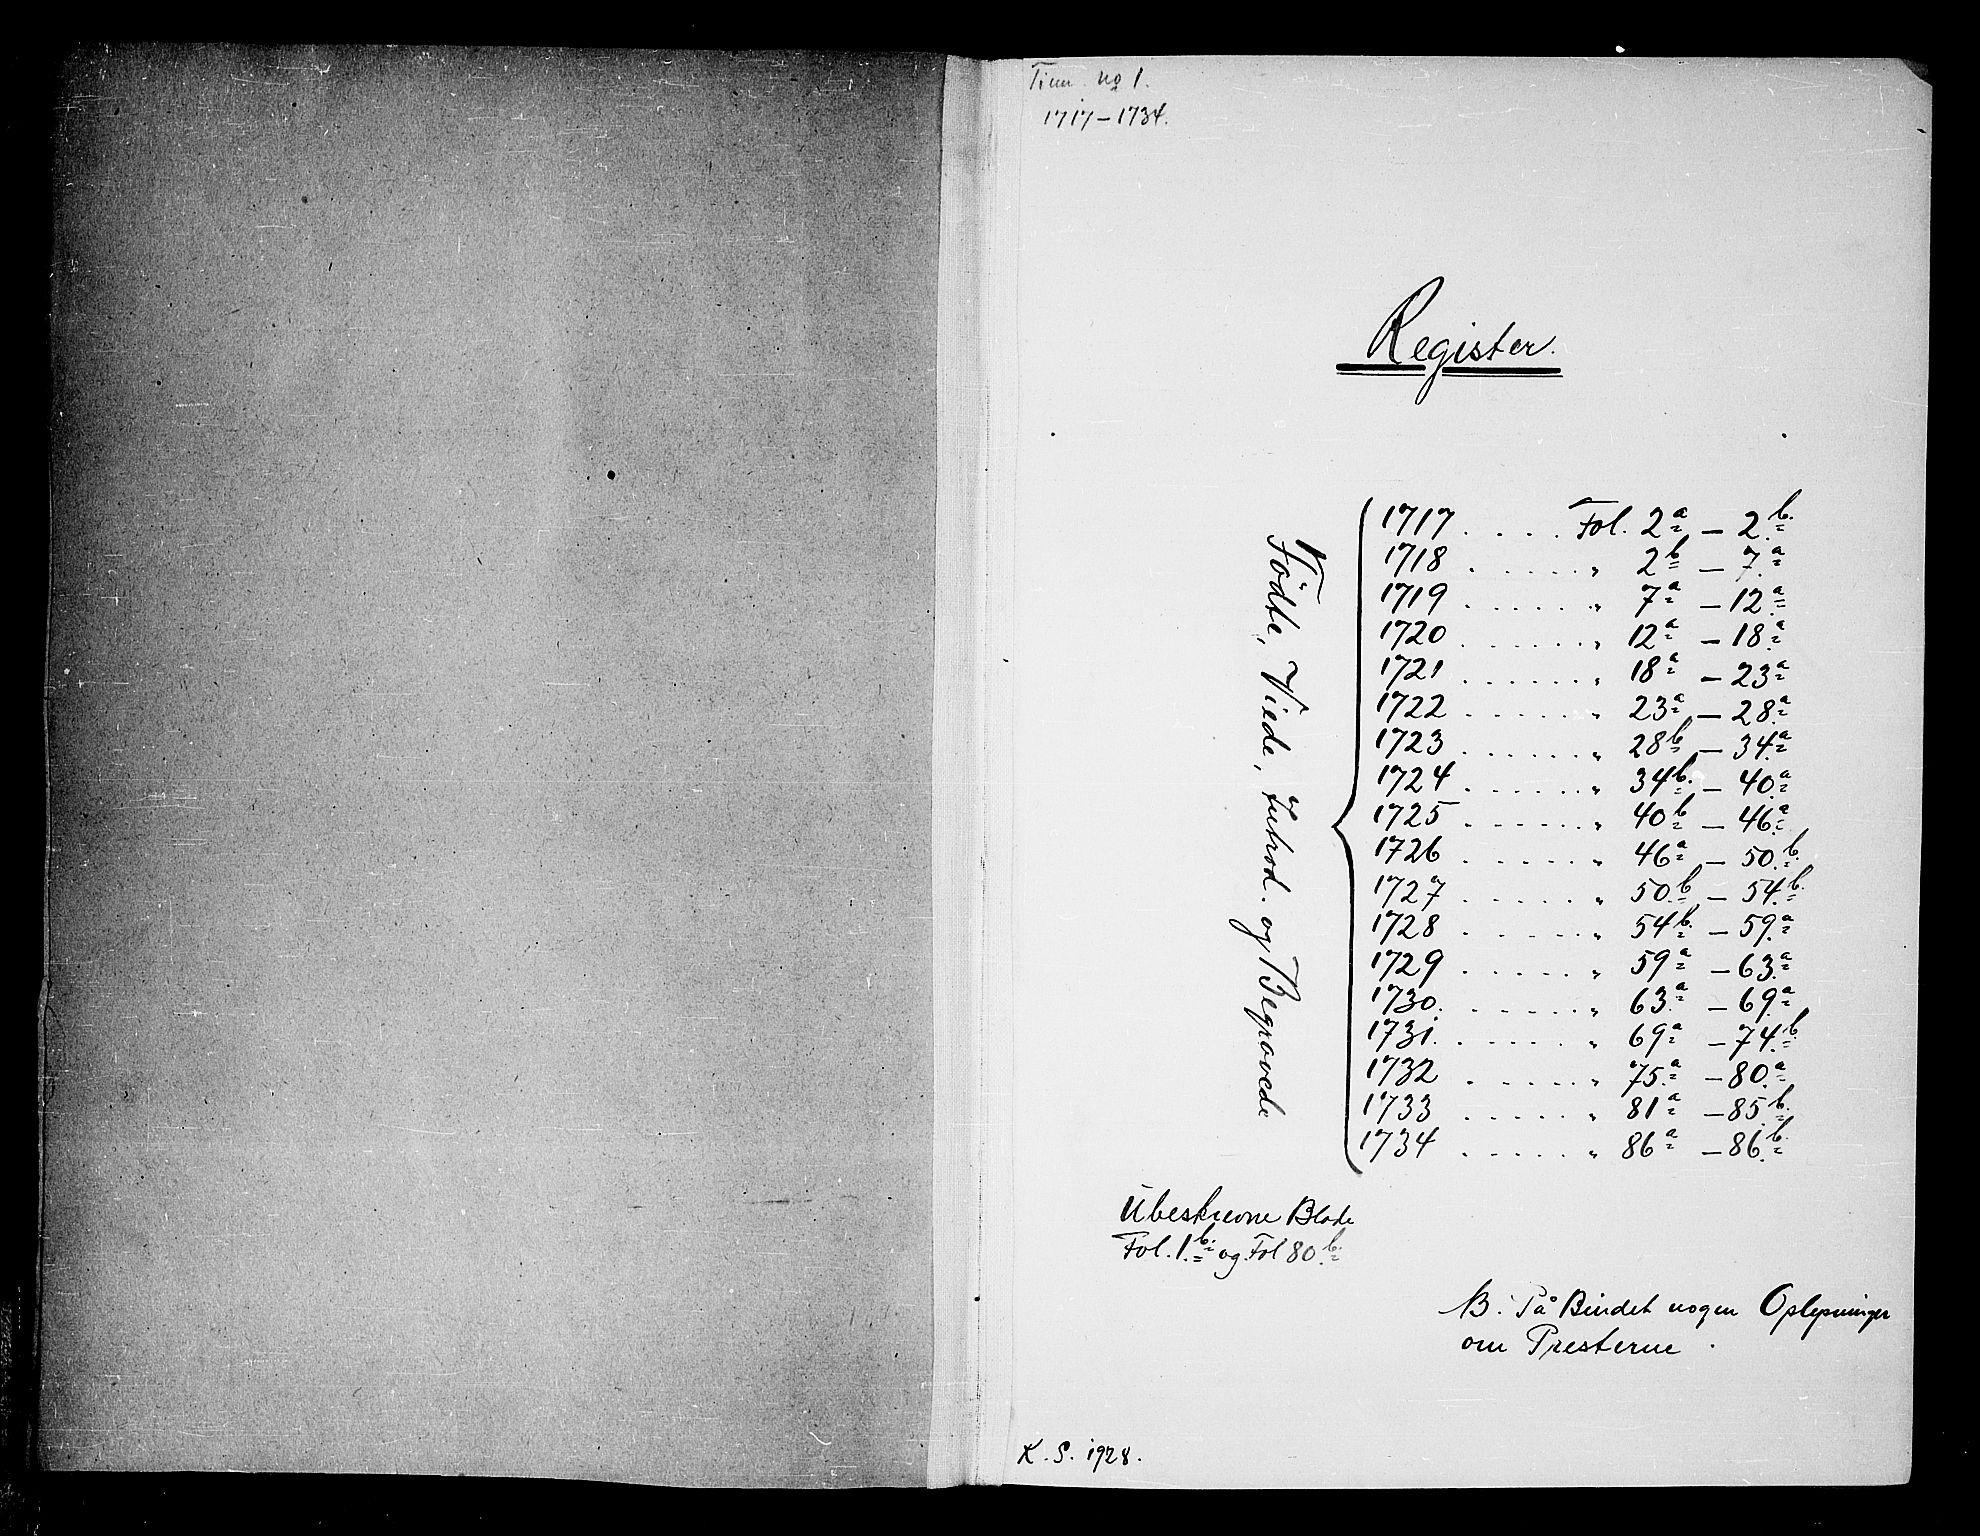 SAKO, Tinn kirkebøker, F/Fa/L0001: Ministerialbok nr. I 1, 1717-1734